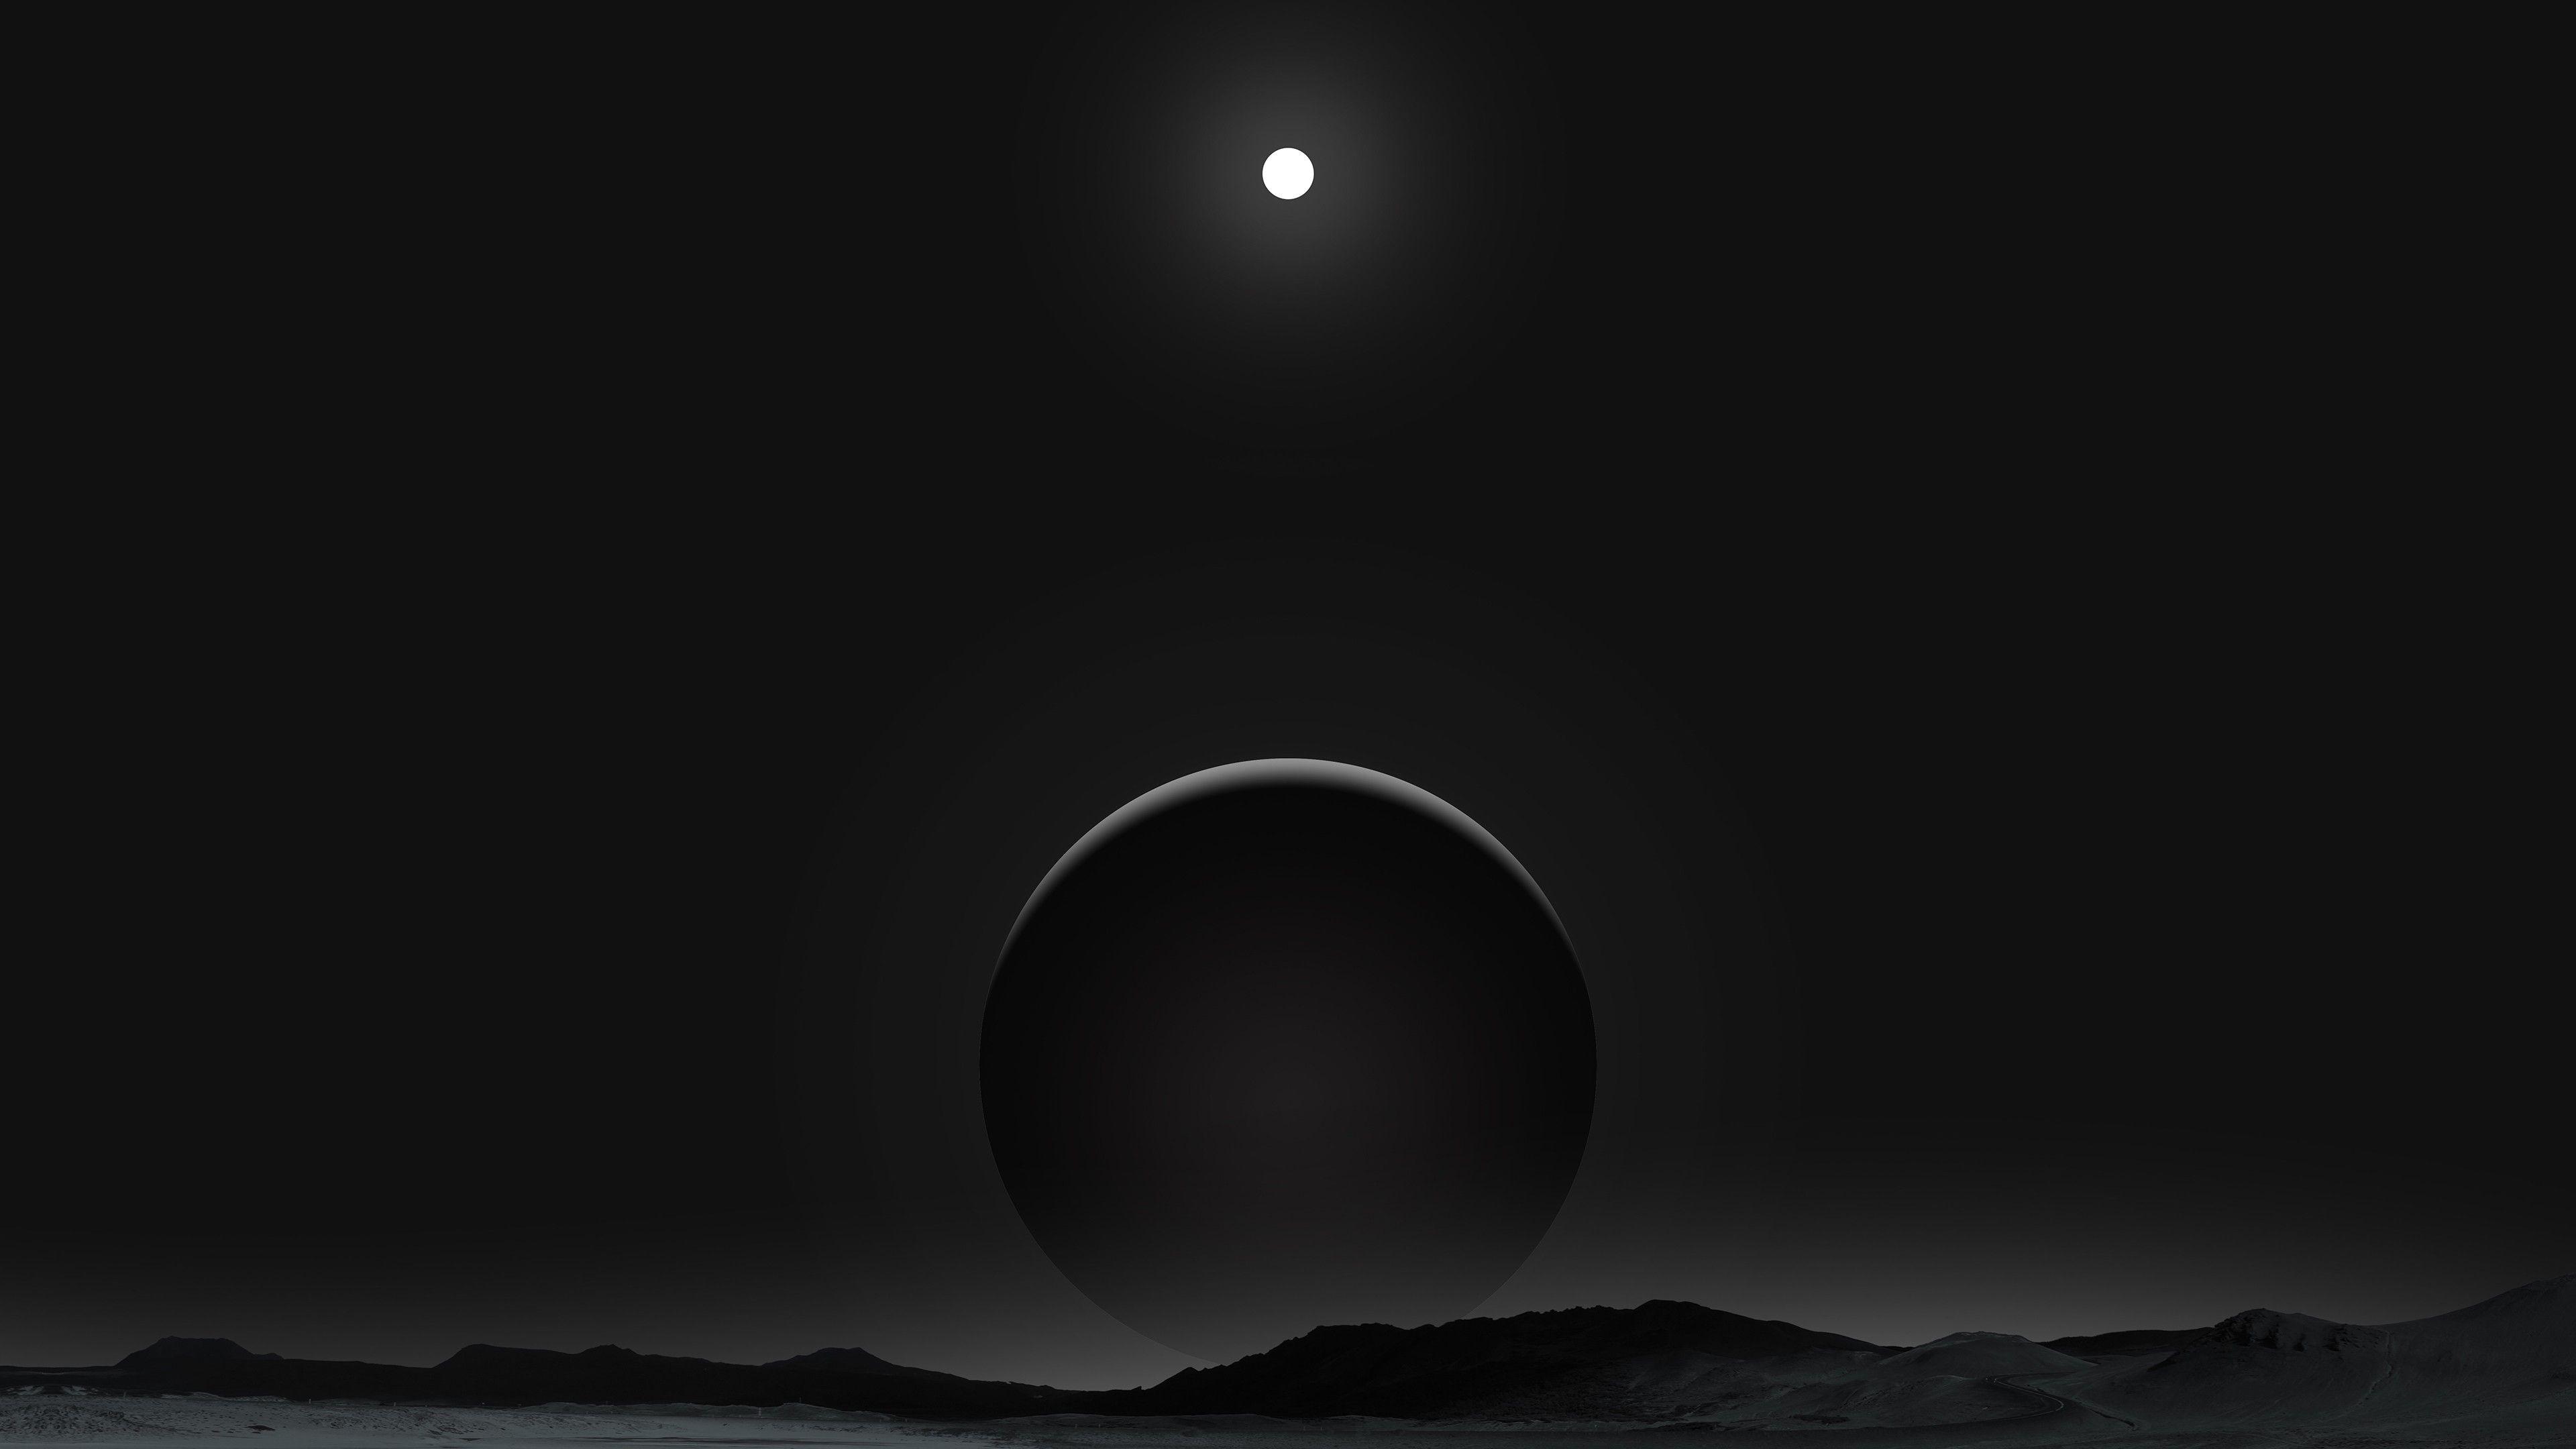 Planet Black Gray Wallpaper No 289603 Dark Wallpaper Hd Wallpaper Art Wallpaper